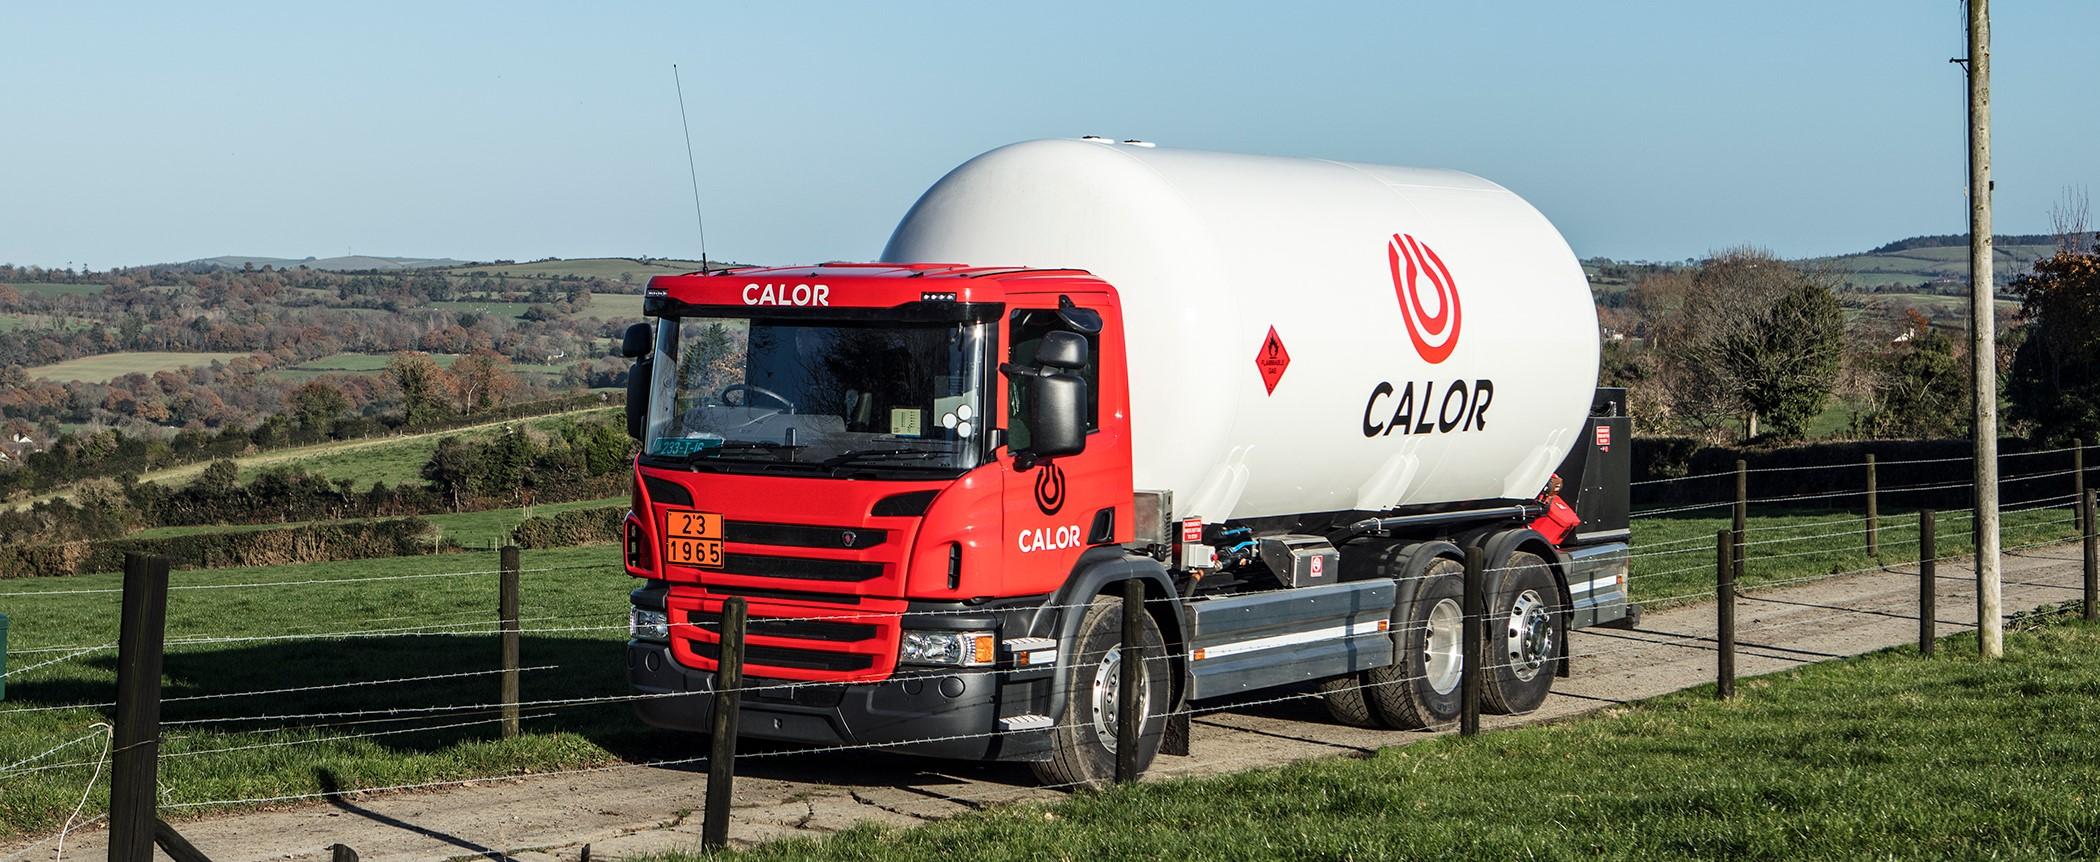 Calor Ireland  improving operations efficiencycut